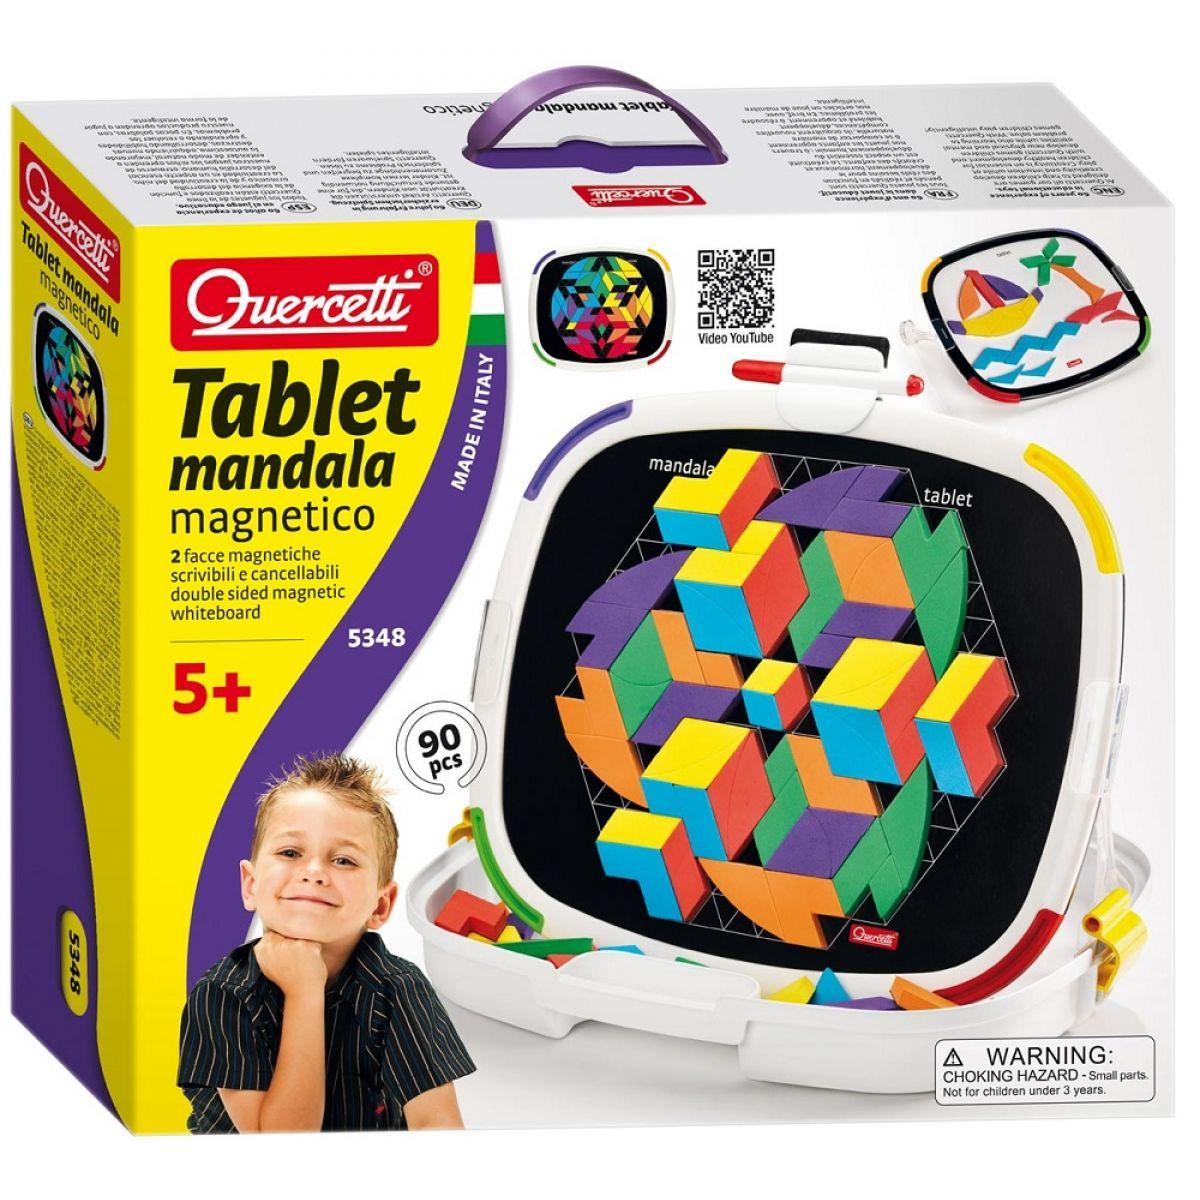 Quercetti Tablet mandala magnetico